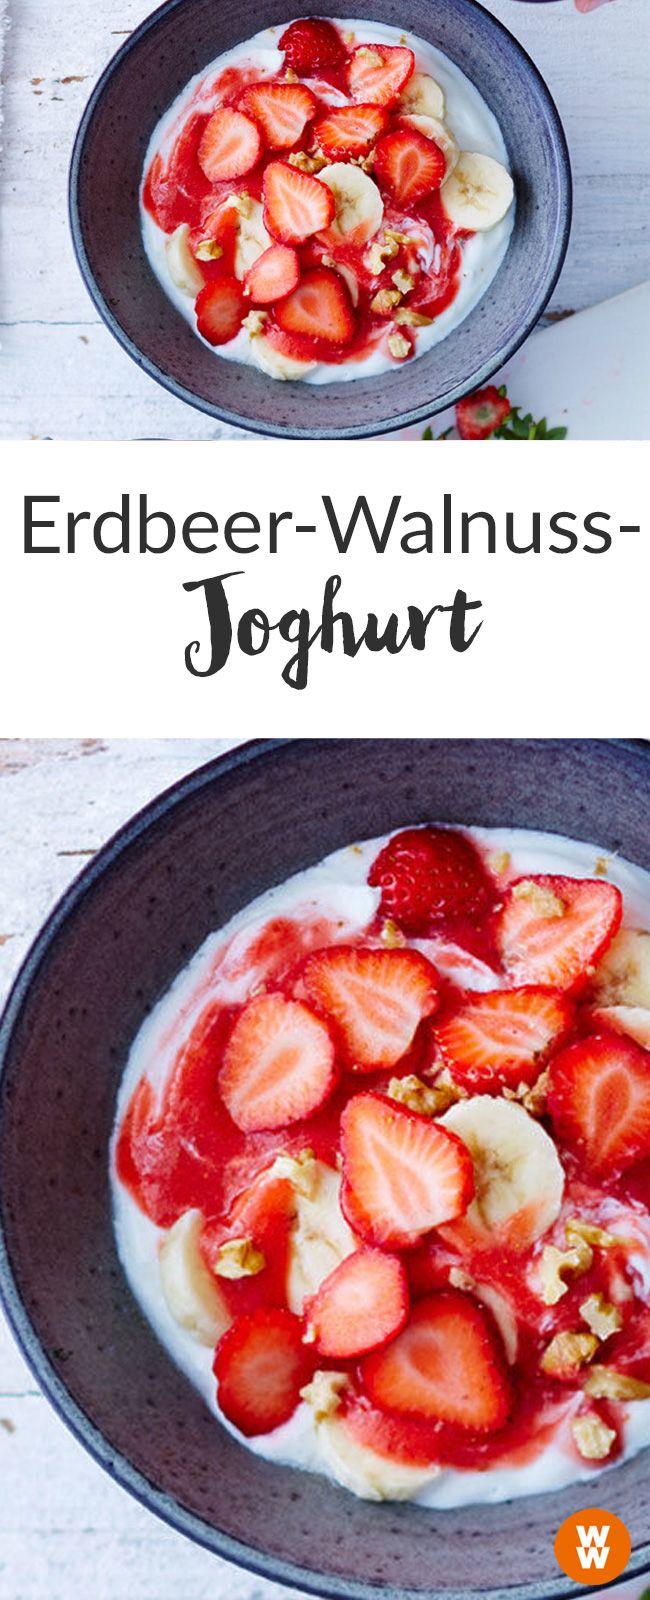 Erdbeer Walnuss Joghurt Yemek Tarifi Diat Pinterest